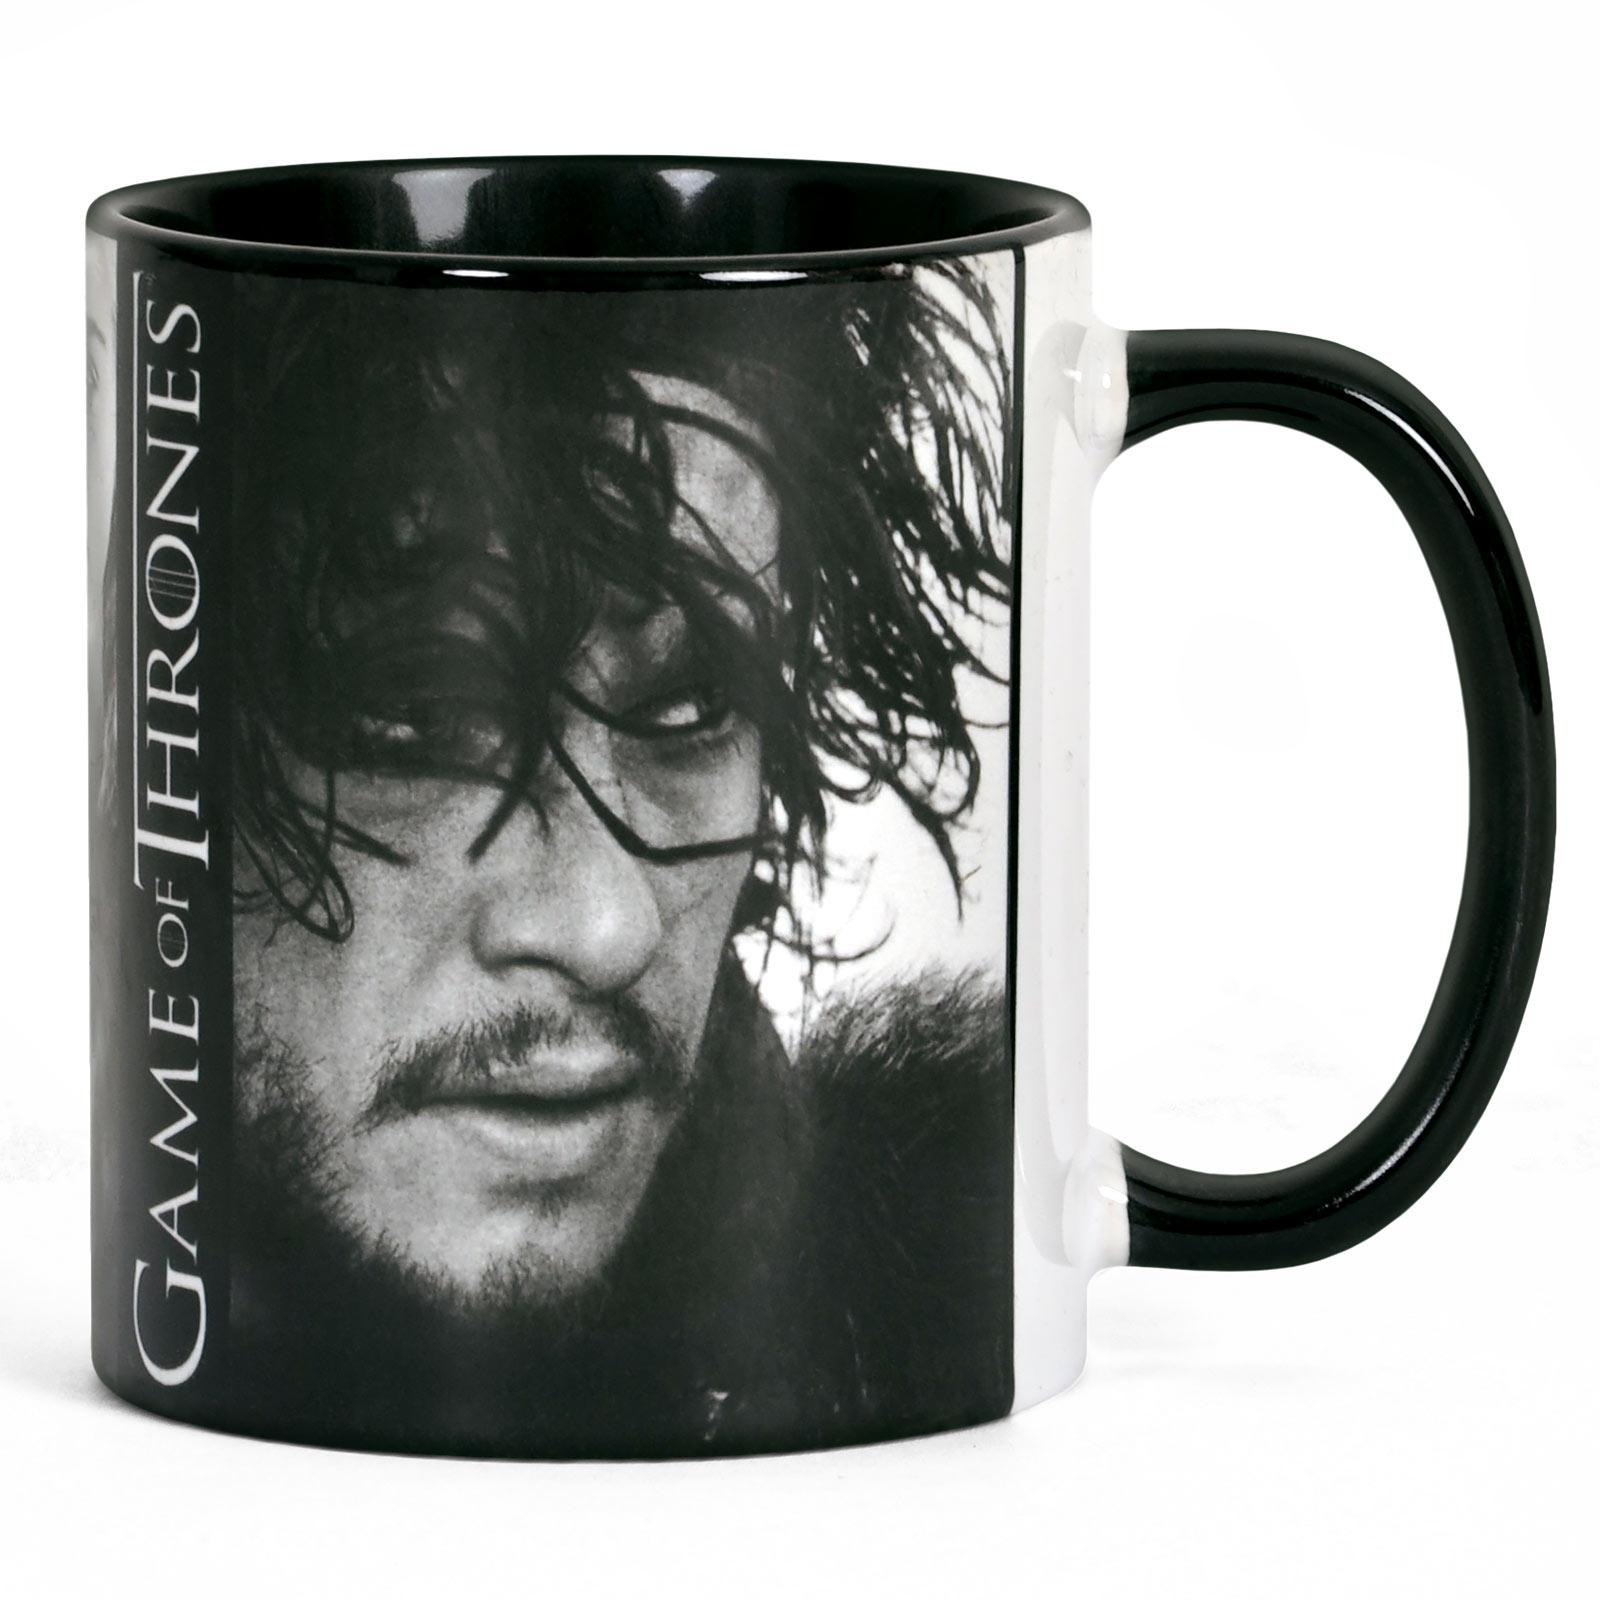 Game of Thrones - Jon Snow Tasse - Black Line